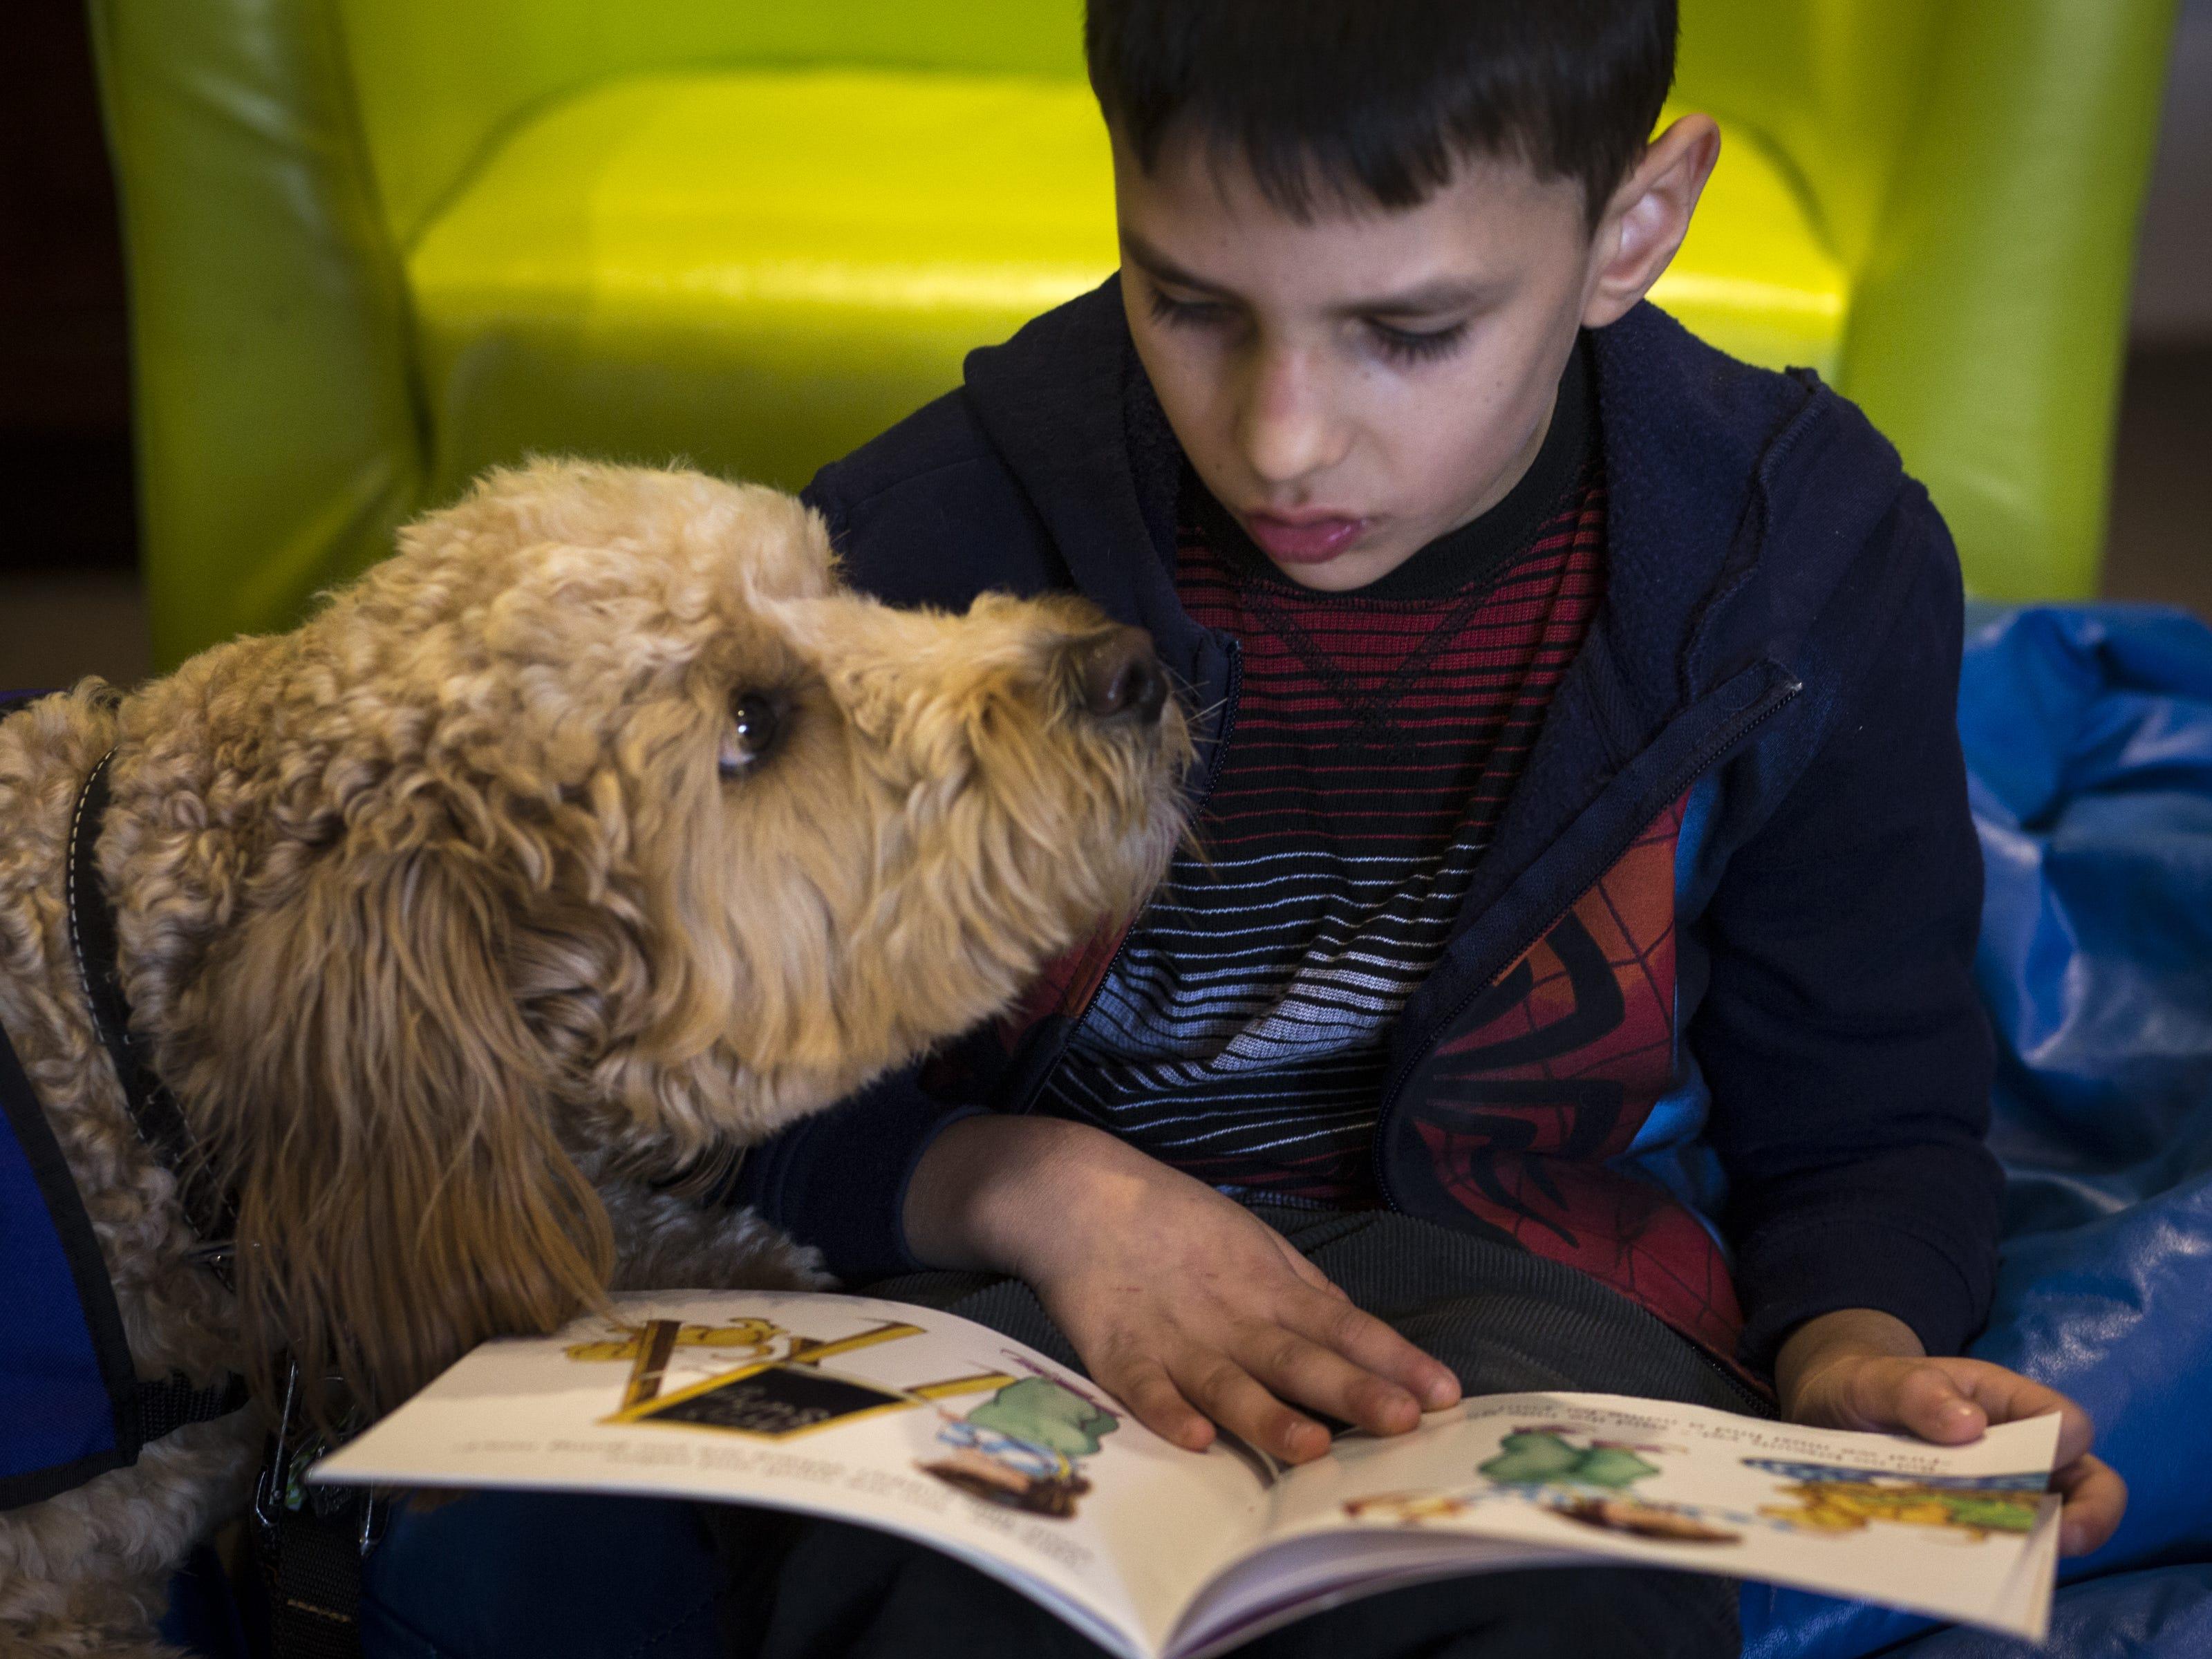 Zane reads to Caymus, Jan. 7, 2019, at Aurora Day School in Peoria.